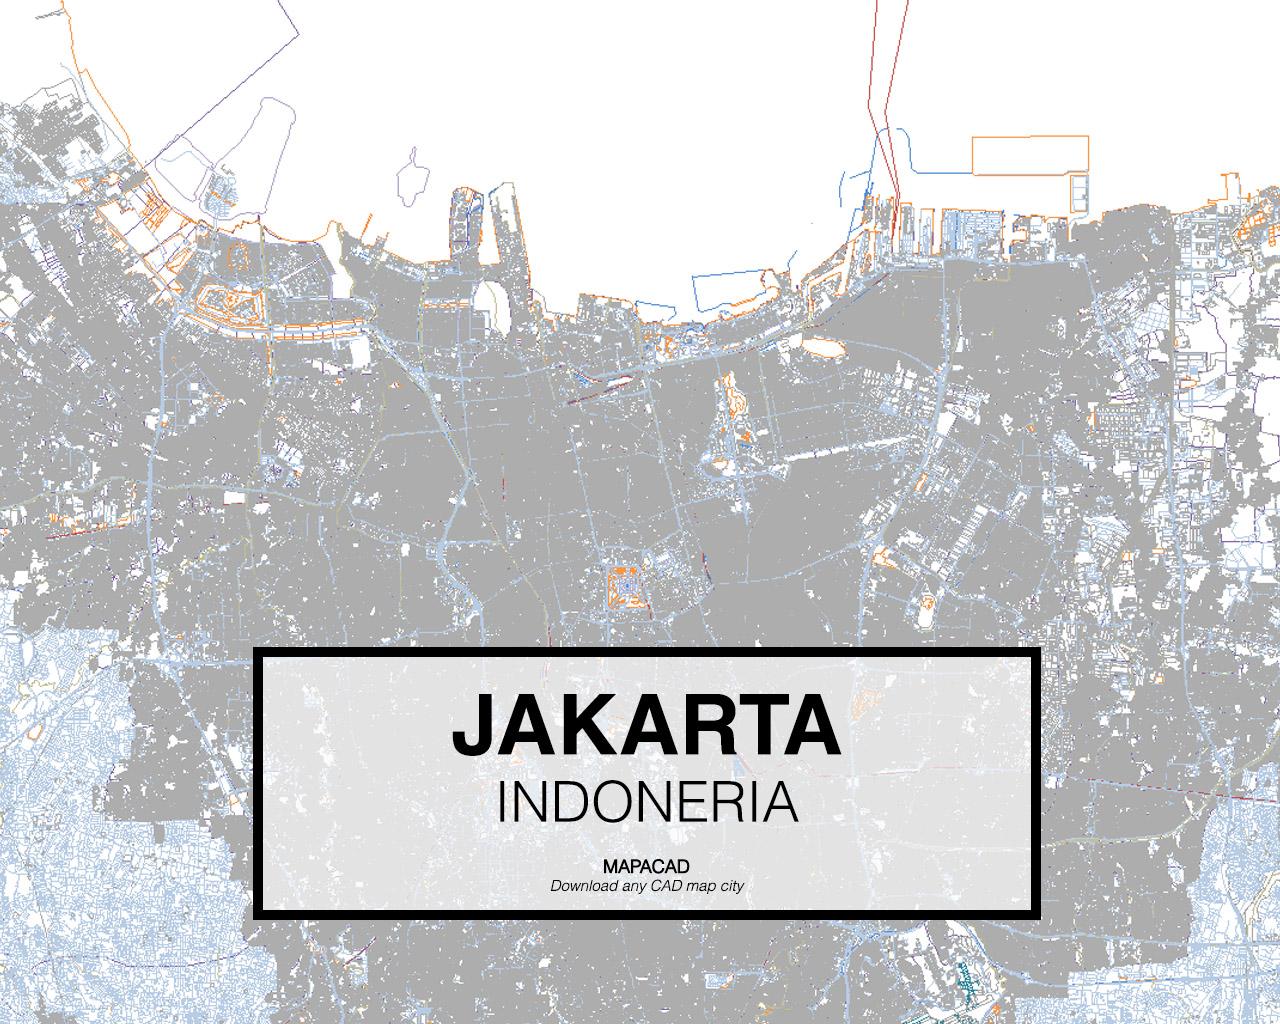 Jakarta-Indonesia-V02-01-Mapacad-download-map-cad-dwg-dxf-autocad-free-2d-3d